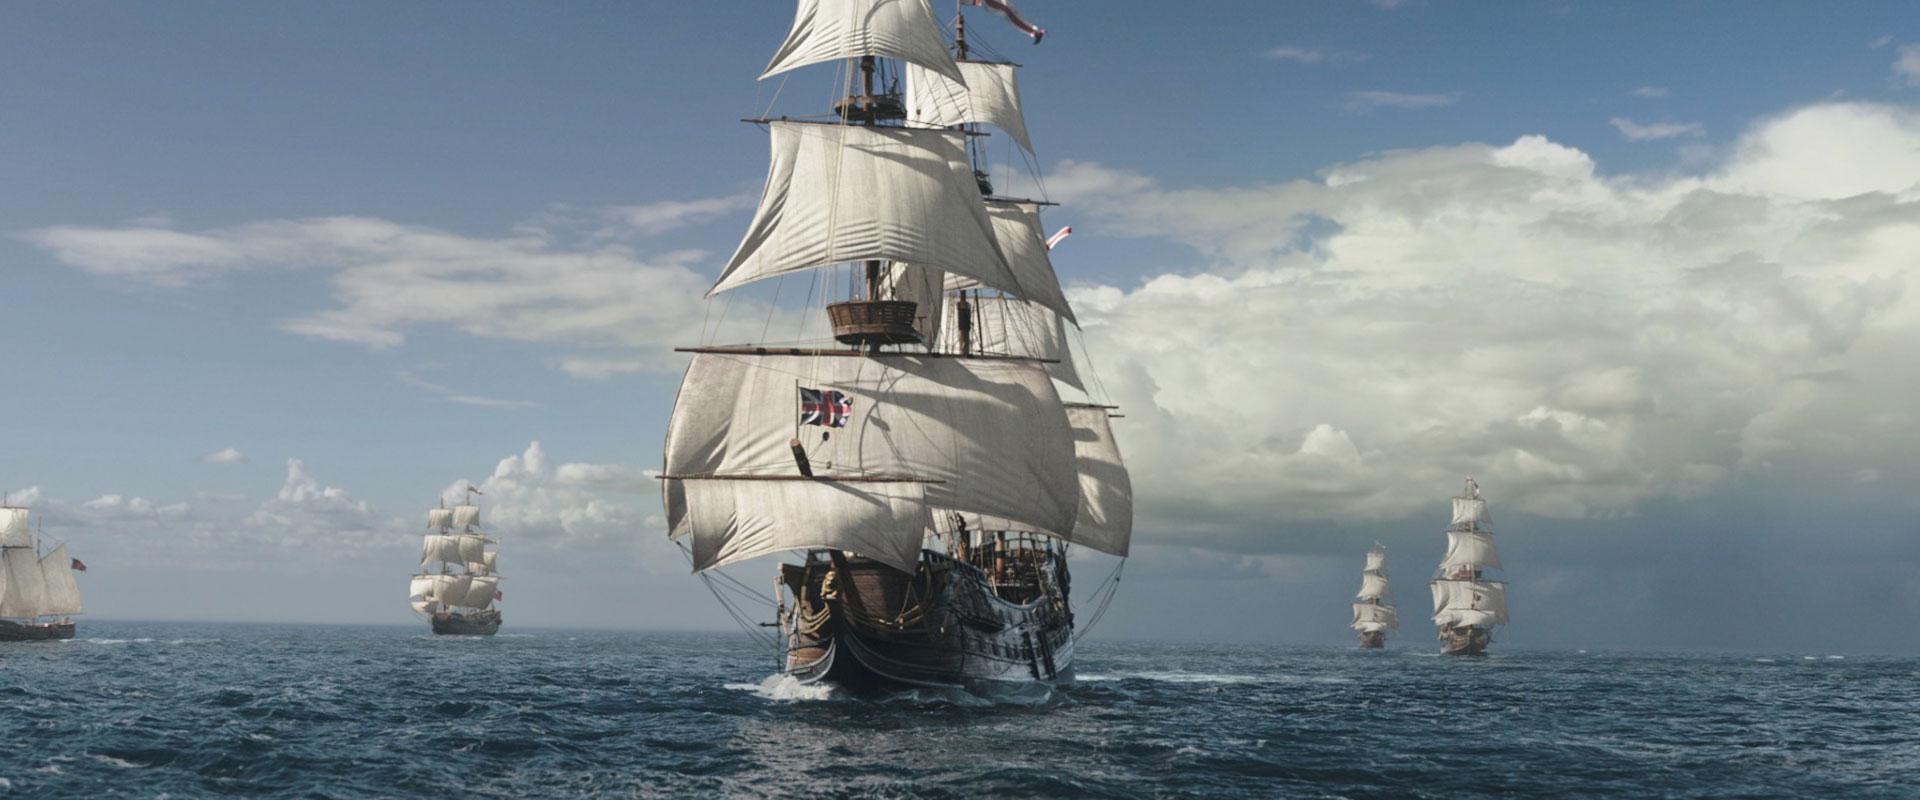 Black Sails TV Show